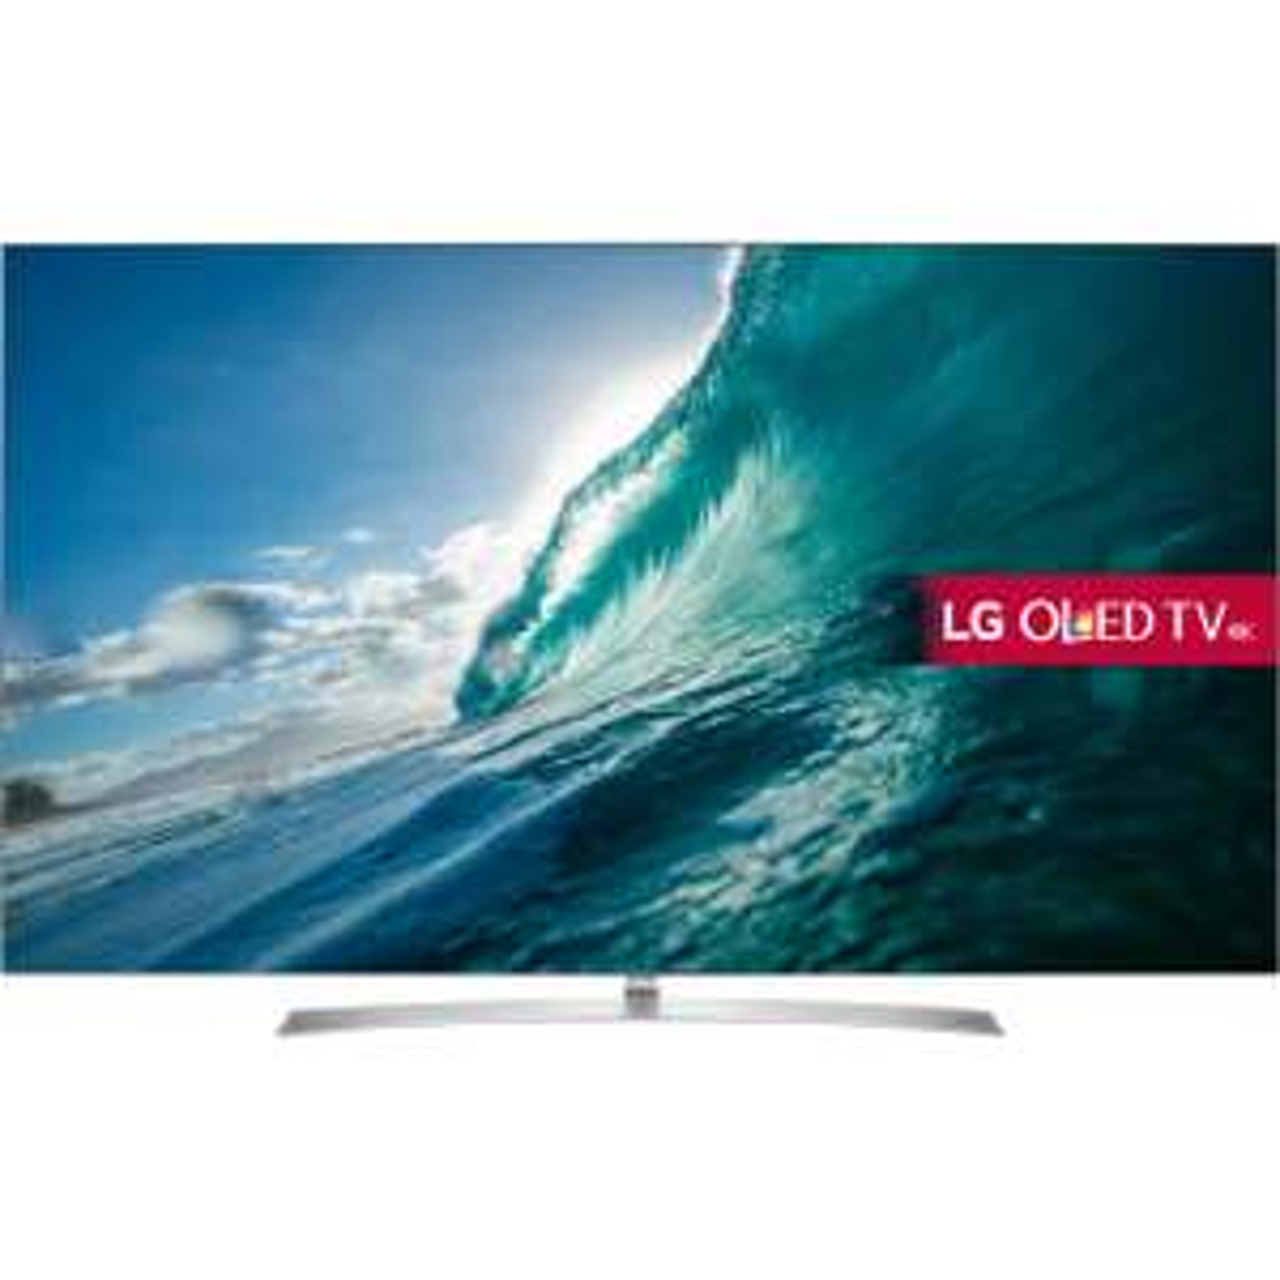 LG OLED55B7V - £1799 Use discount code OLED300 for £300 off - £1499 @ AO